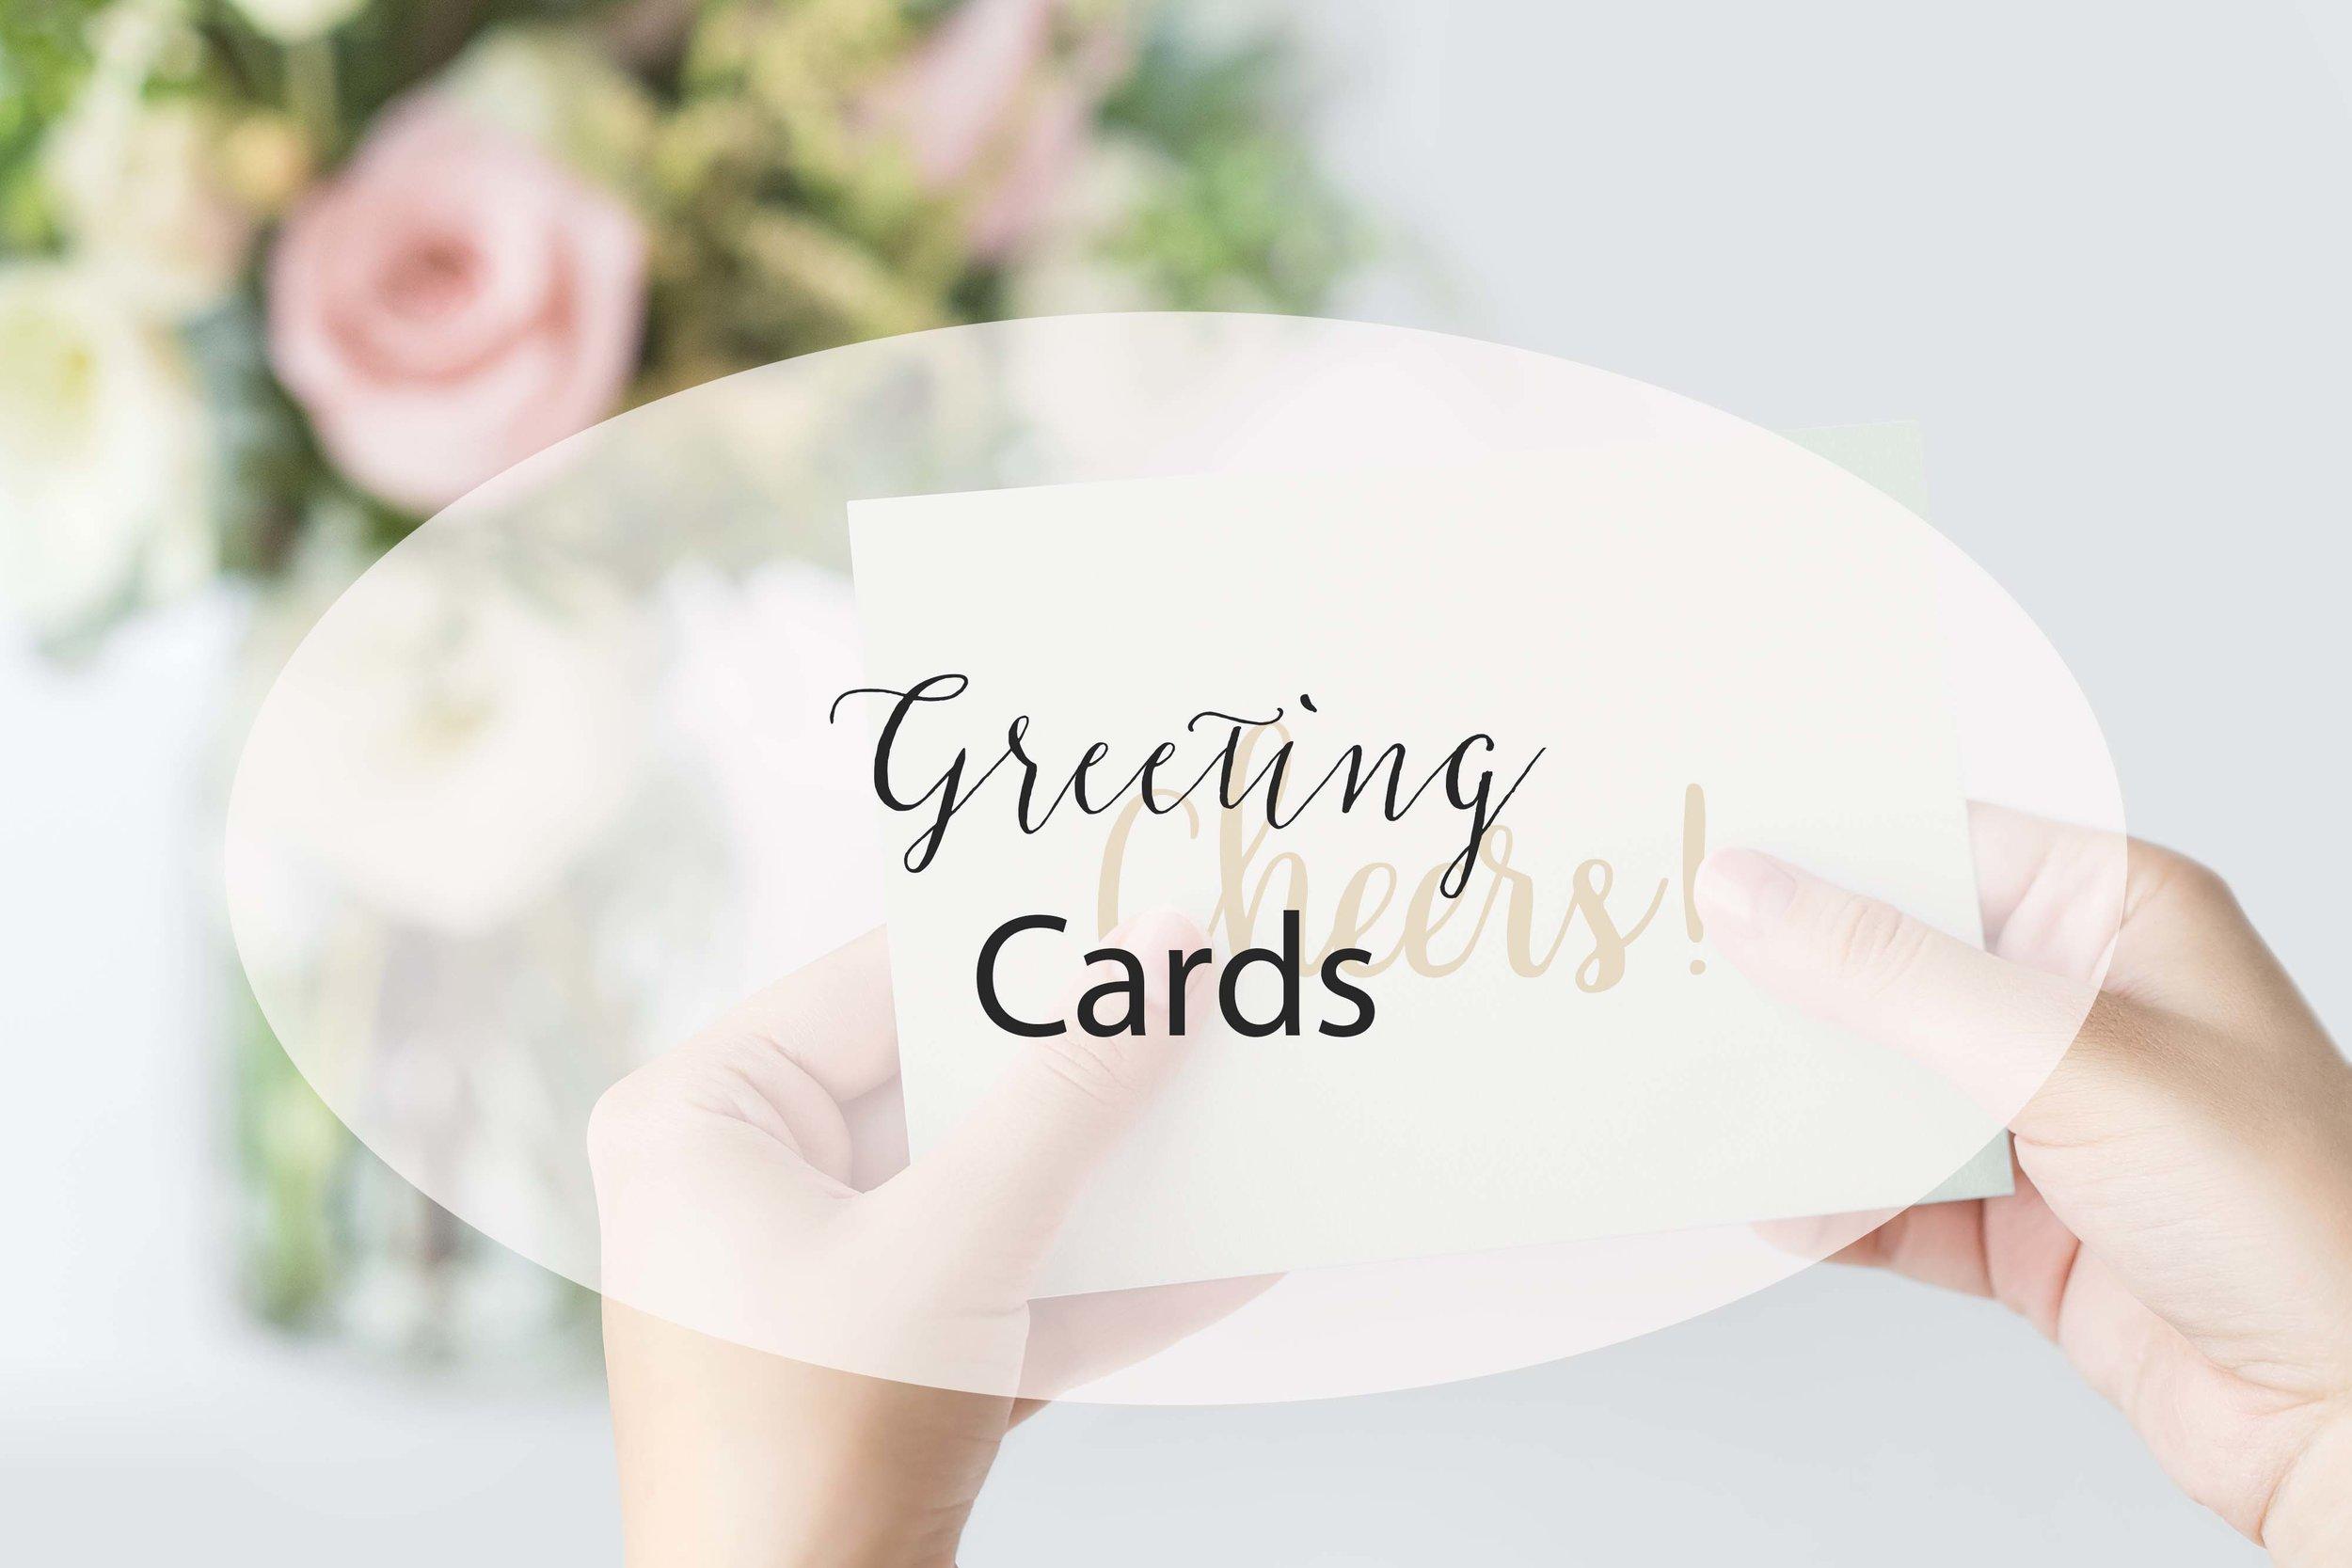 Invitation Card in Hands 1.jpg